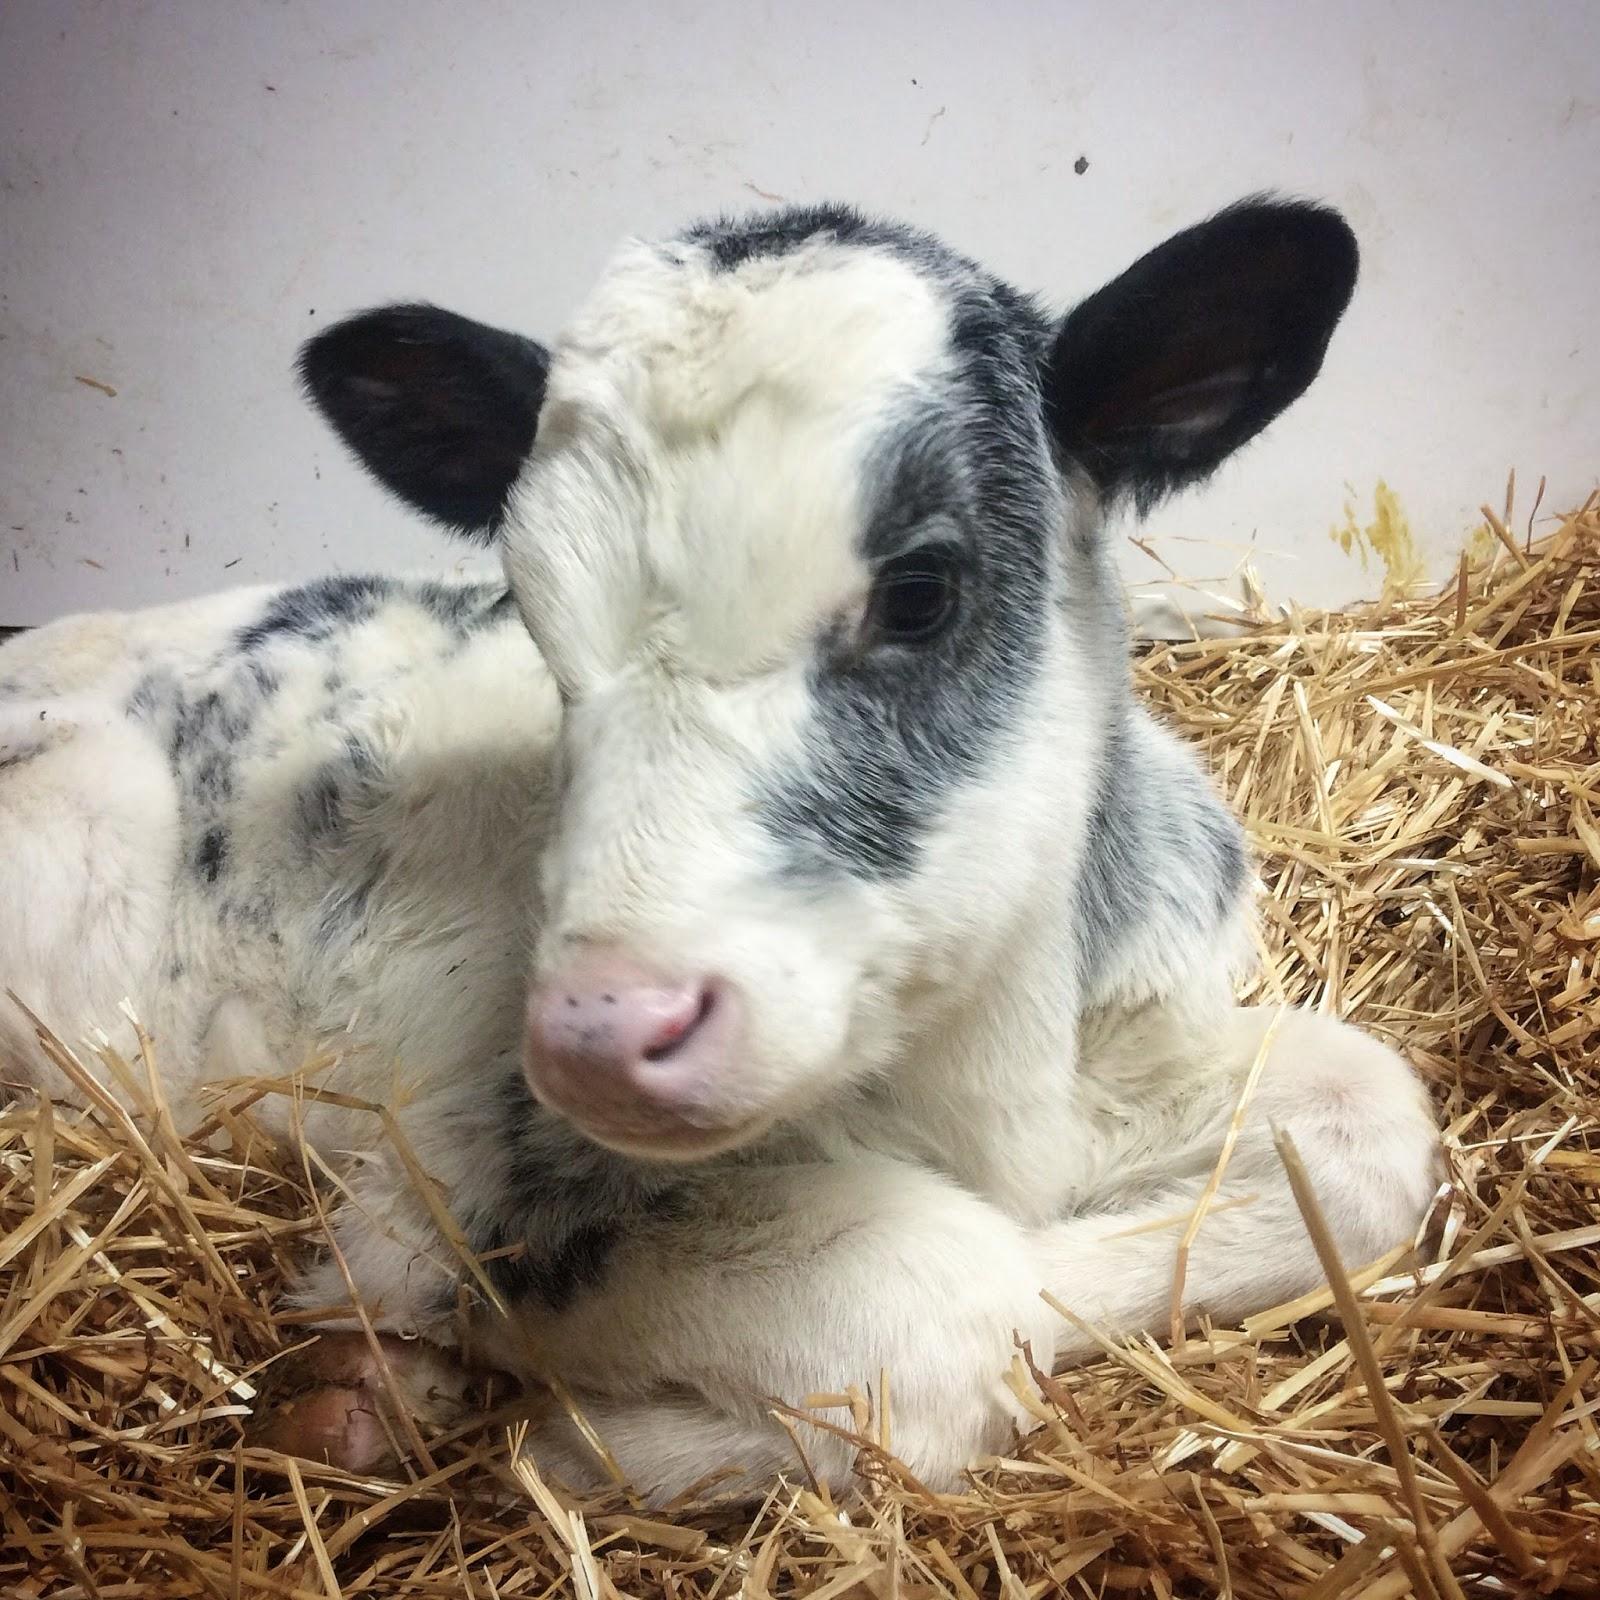 blue roan Holstein x Milking Shorthorn dairy calf